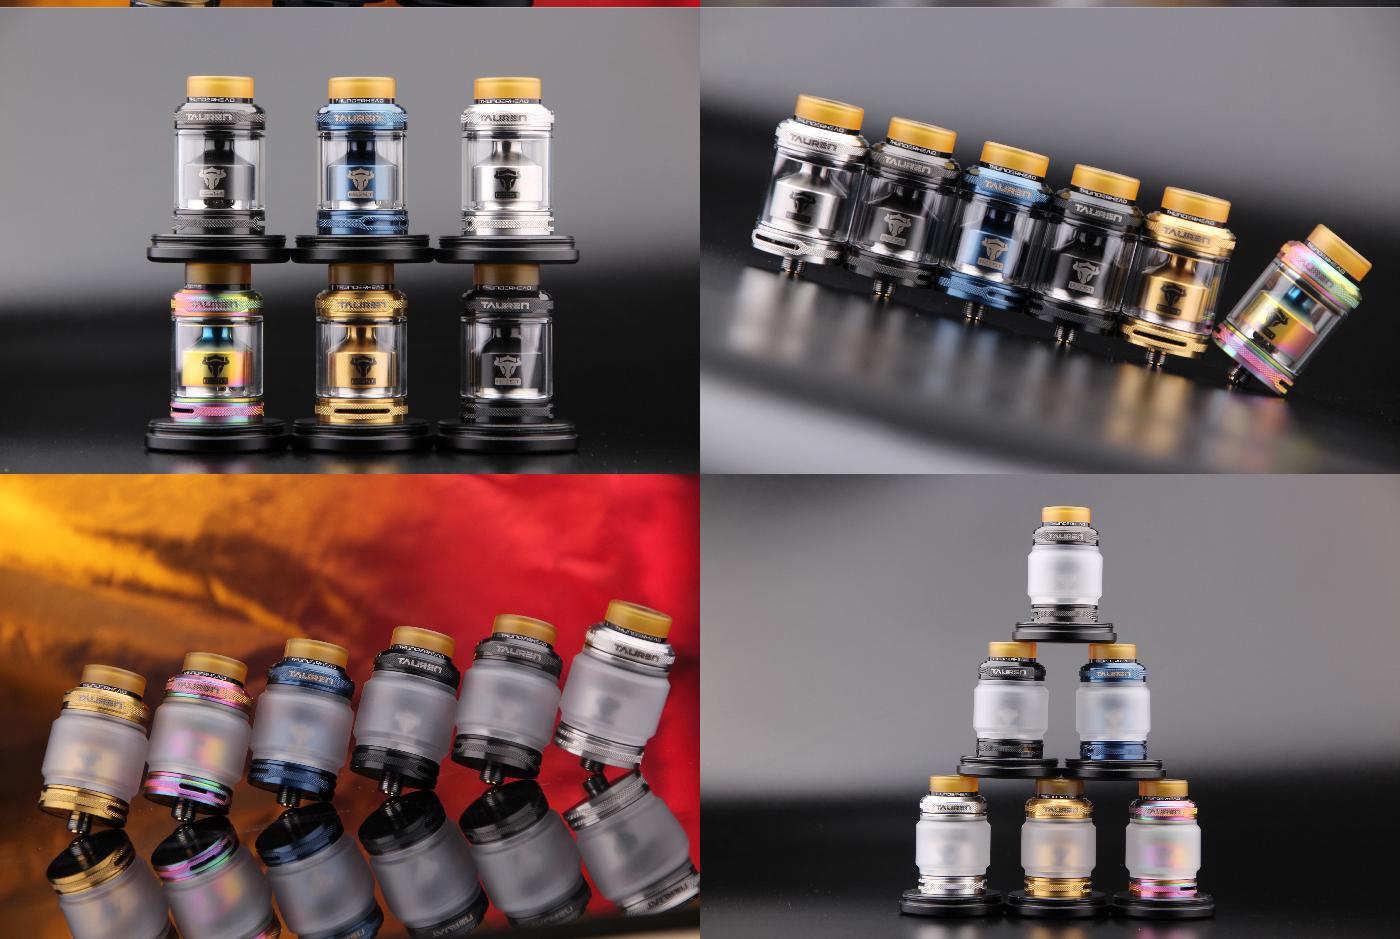 cd2f77580af1d3178f9bb4c84303da38 Thunder Head Creations Tauren RTA 2ml / 4.5ml Xsmokers